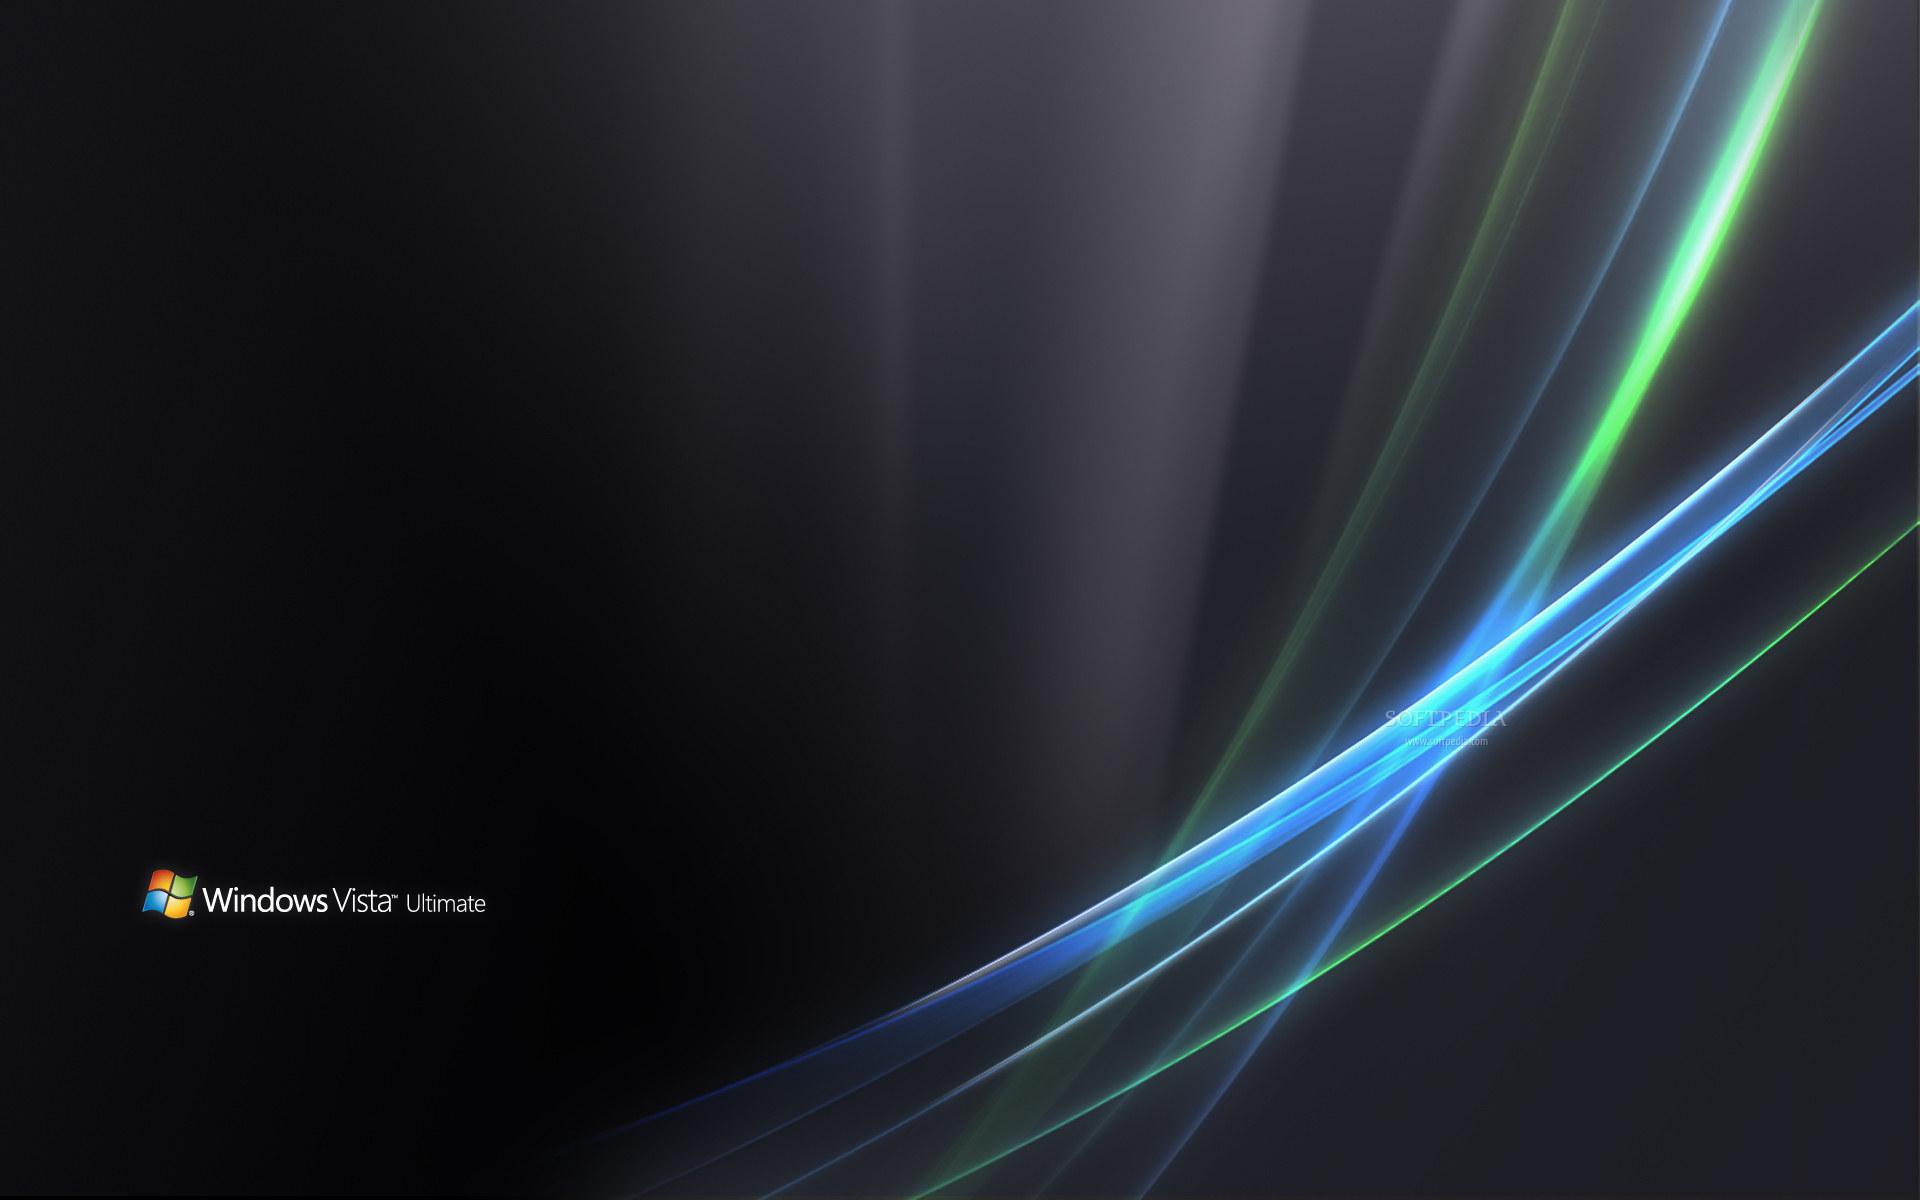 download windows ultimate wallpaper - strands